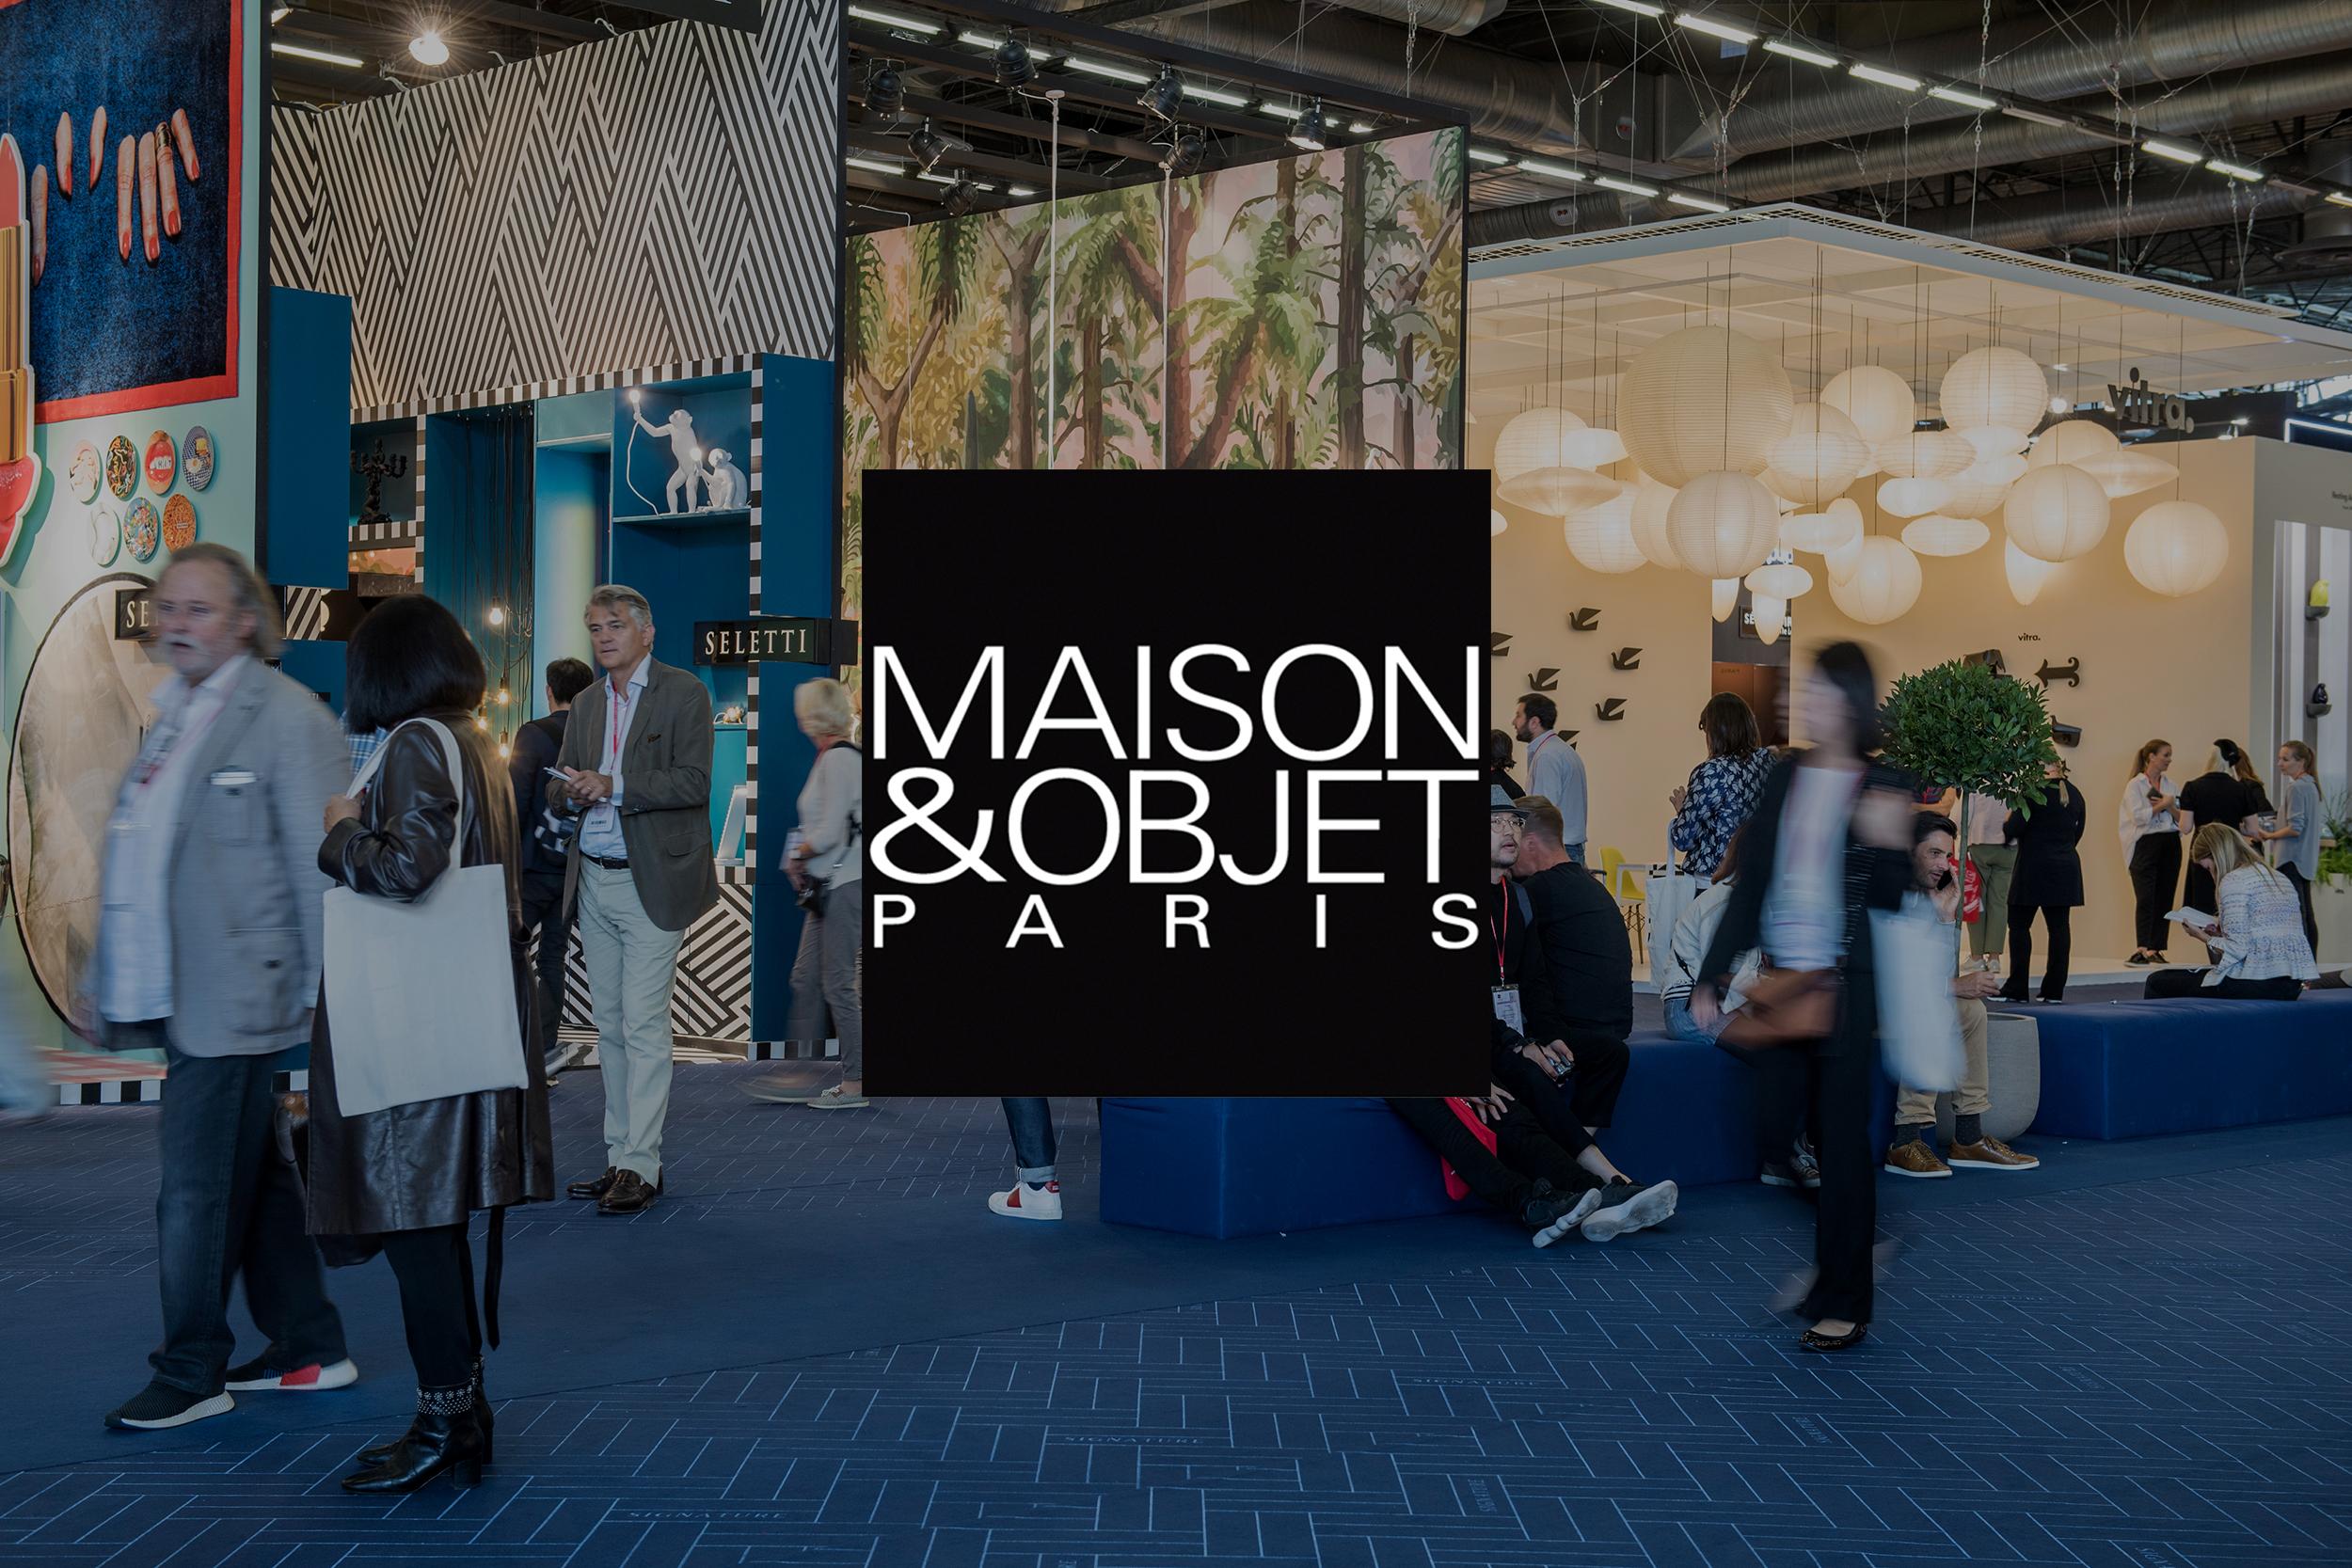 MAISON&OBJET: Inspired by a certain – je ne sais quoi